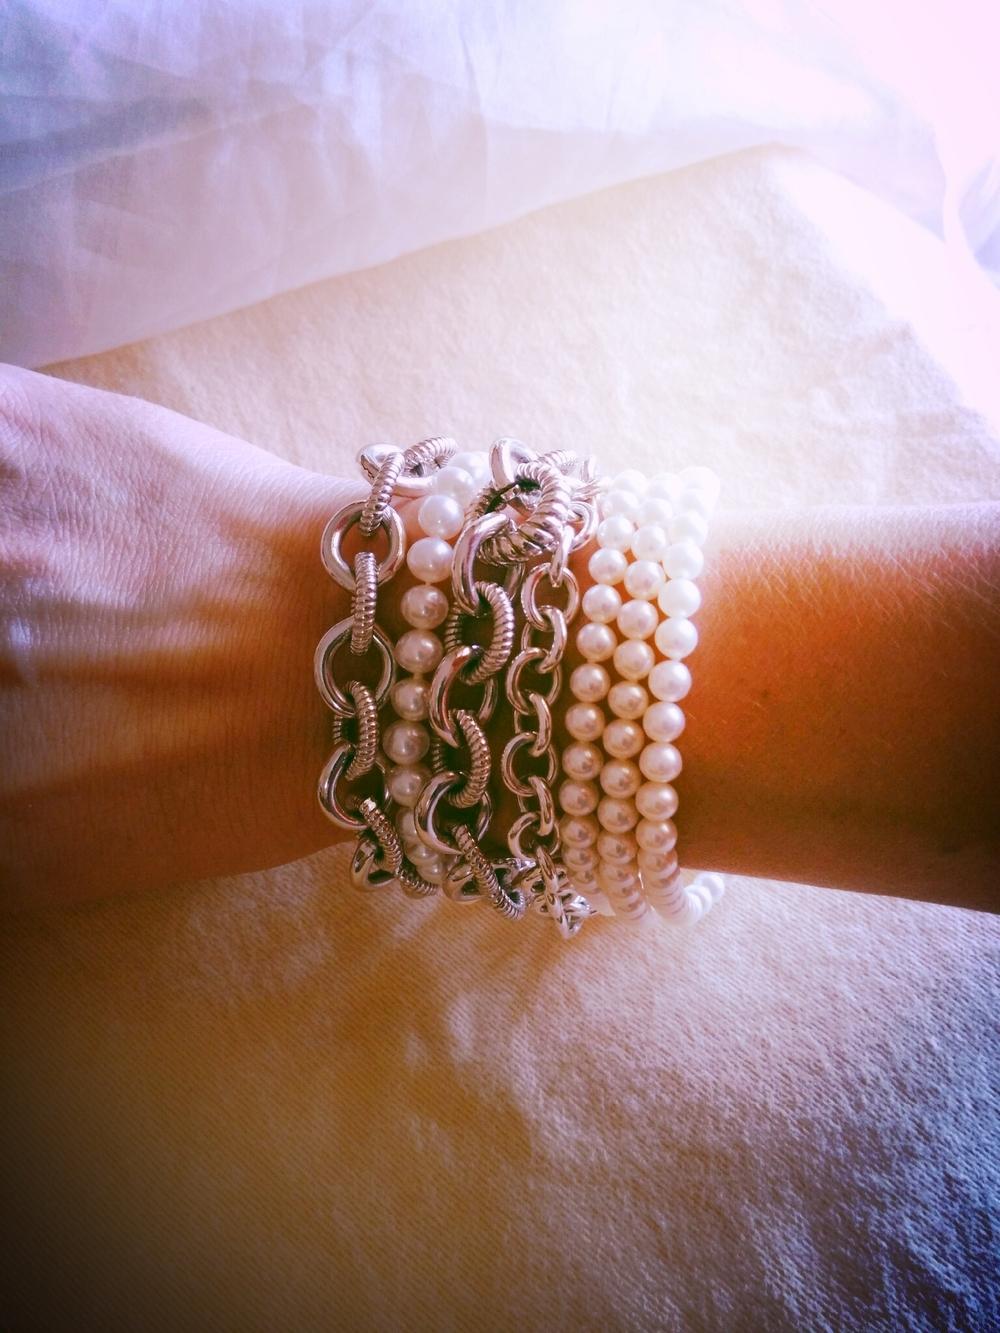 GGZ Layered Bracelets Bridal Jewelry.jpg